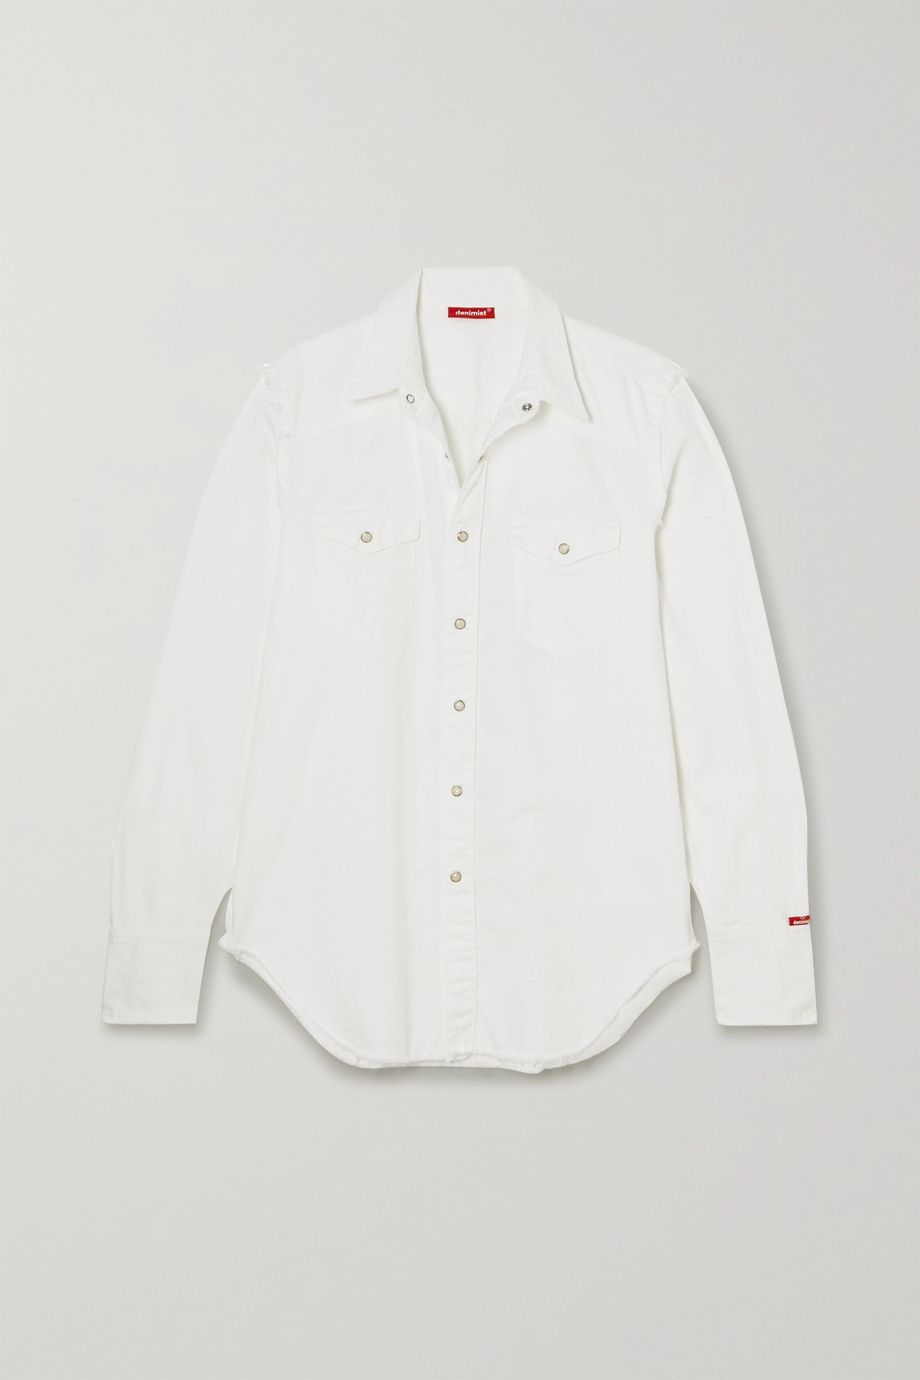 Denimist Cowboy distressed cotton-twill shirt